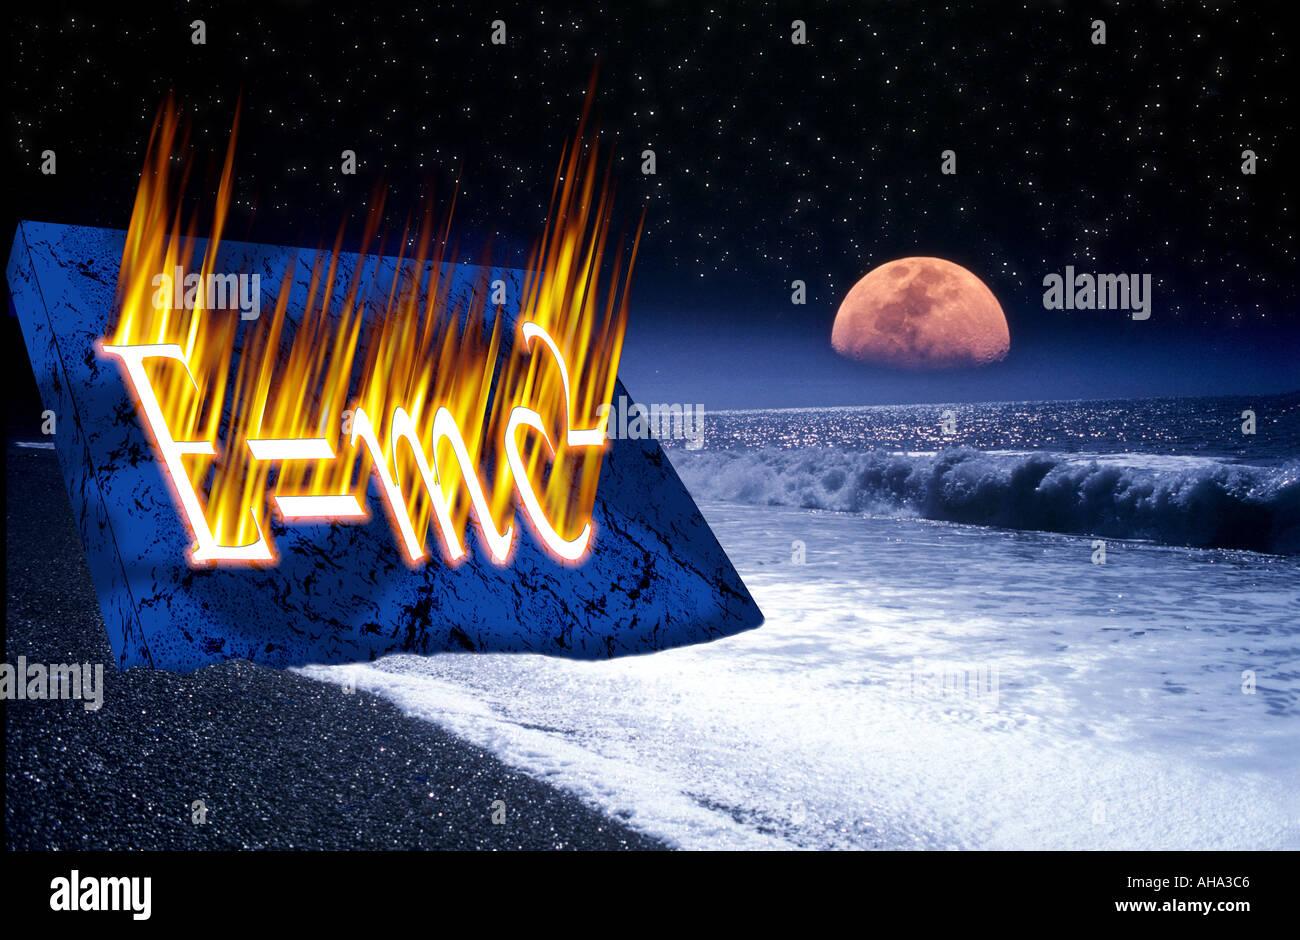 concept moonrise over waves breaking deserted beach with star lit sky Albert Einstein equation E mc2 burnt into Stock Photo